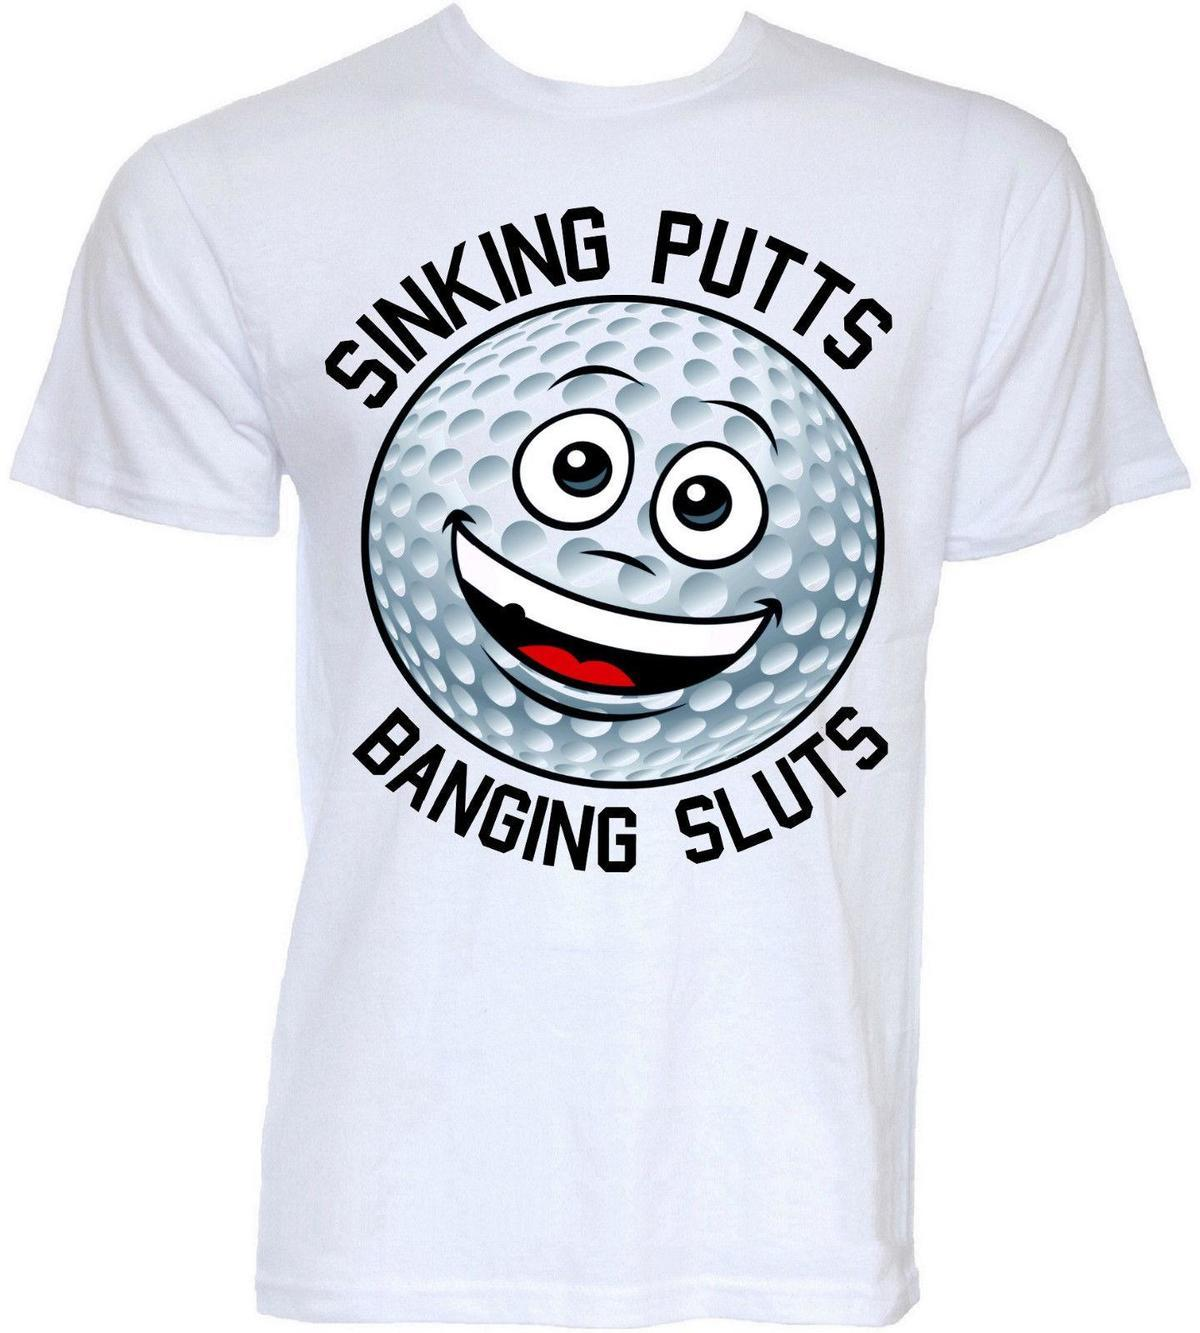 63c909ca71 MENS FUNNY GOLF T SHIRTS COOL NOVELTY GOLFER GOLFING JOKE SLOGAN GIFTS T  SHIRT Graphic Tee Shirts T Shirt Sayings From Jie43, $14.67| DHgate.Com